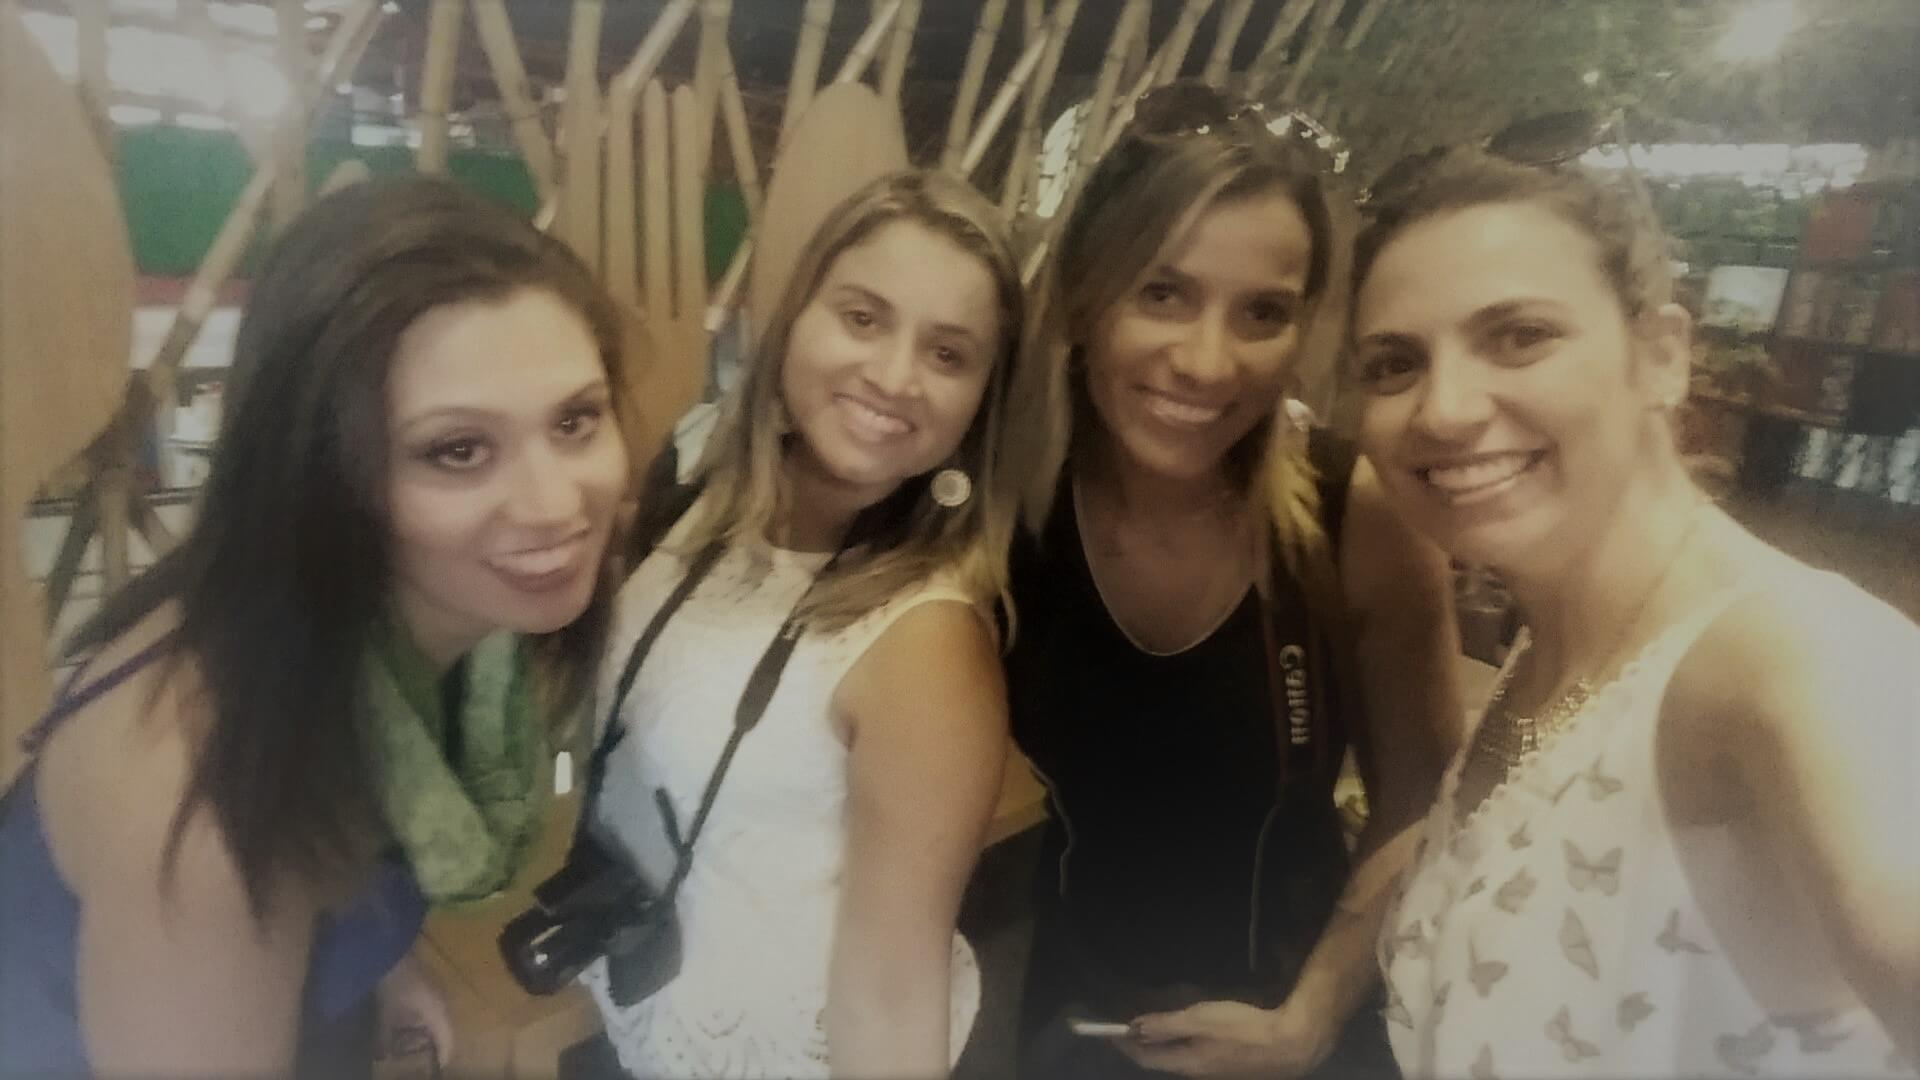 Blogueiras de viagem no Mercado central de BH